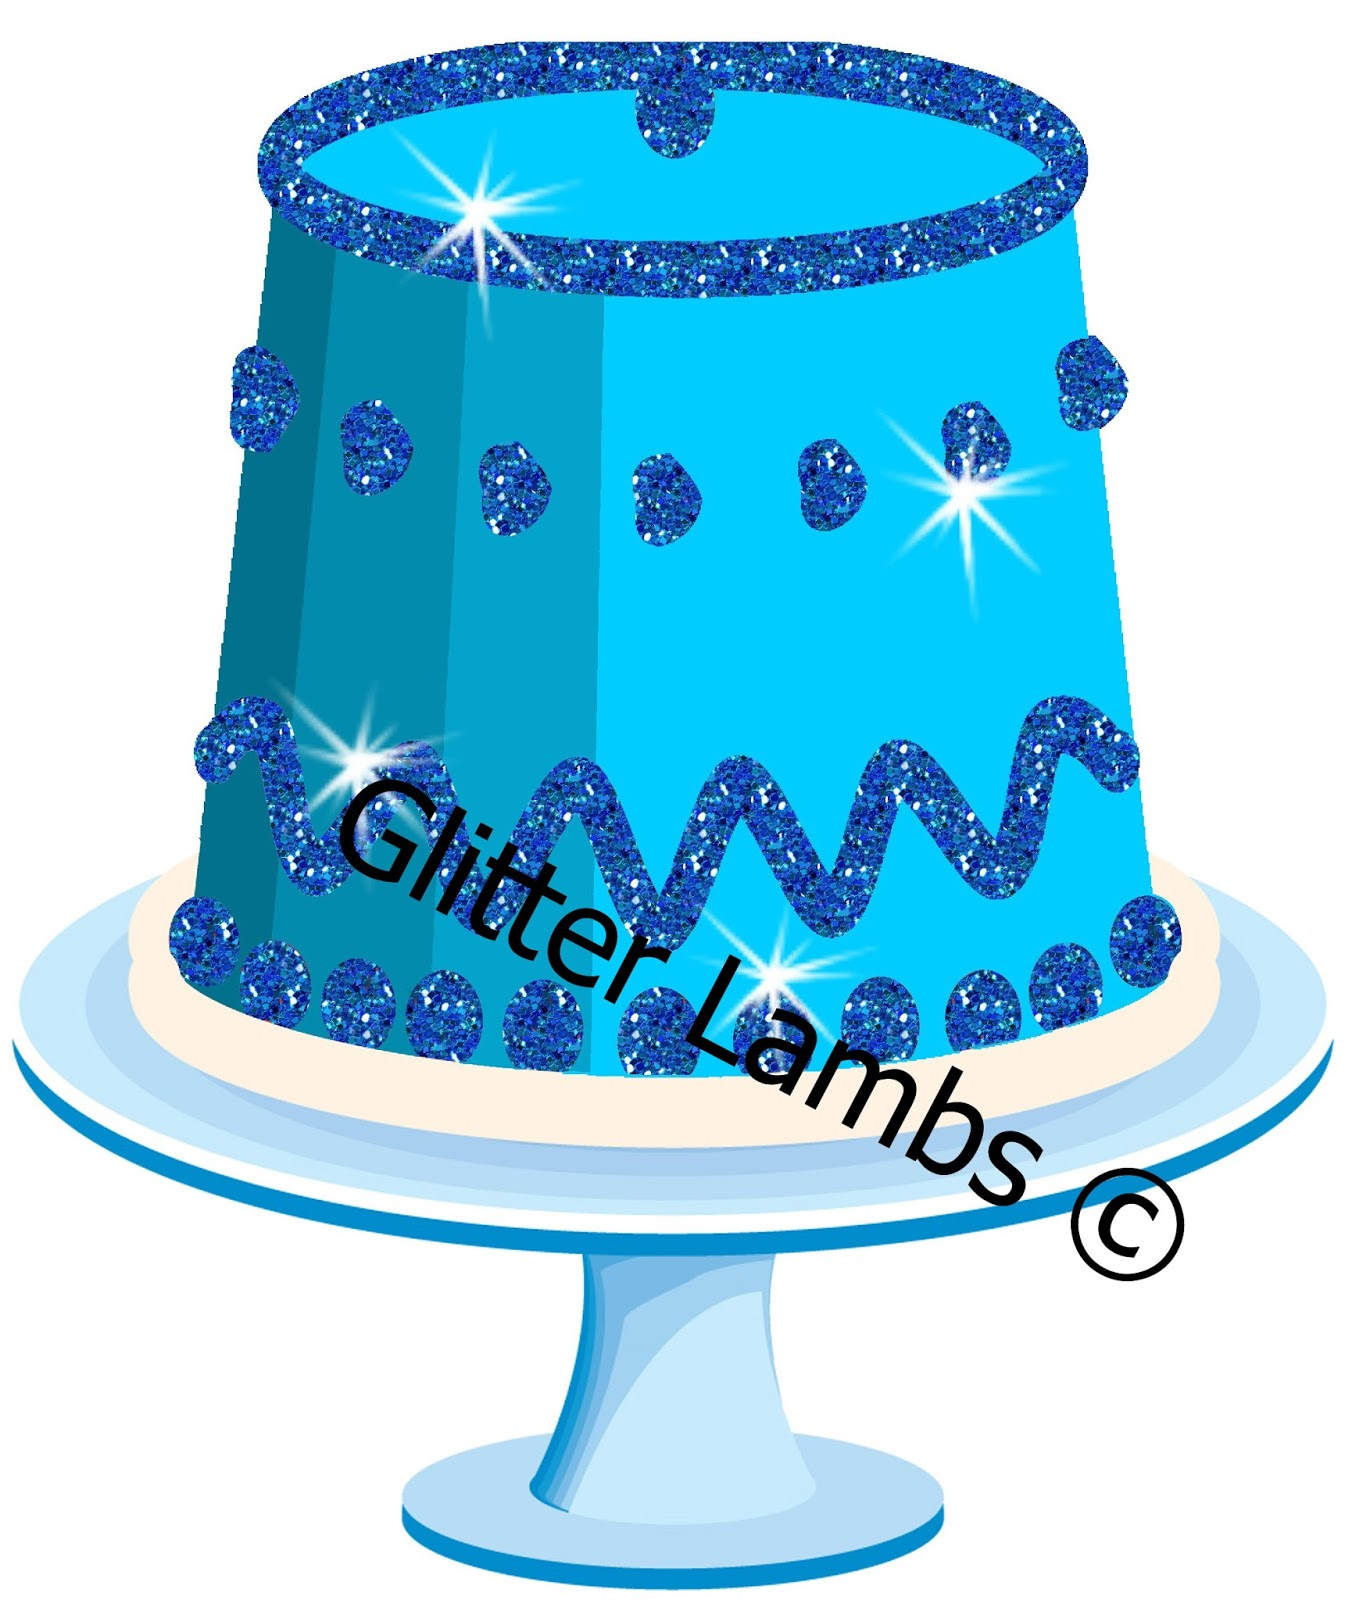 Glitter Lambs Blue Glitter Birthday Party Cake Clipart